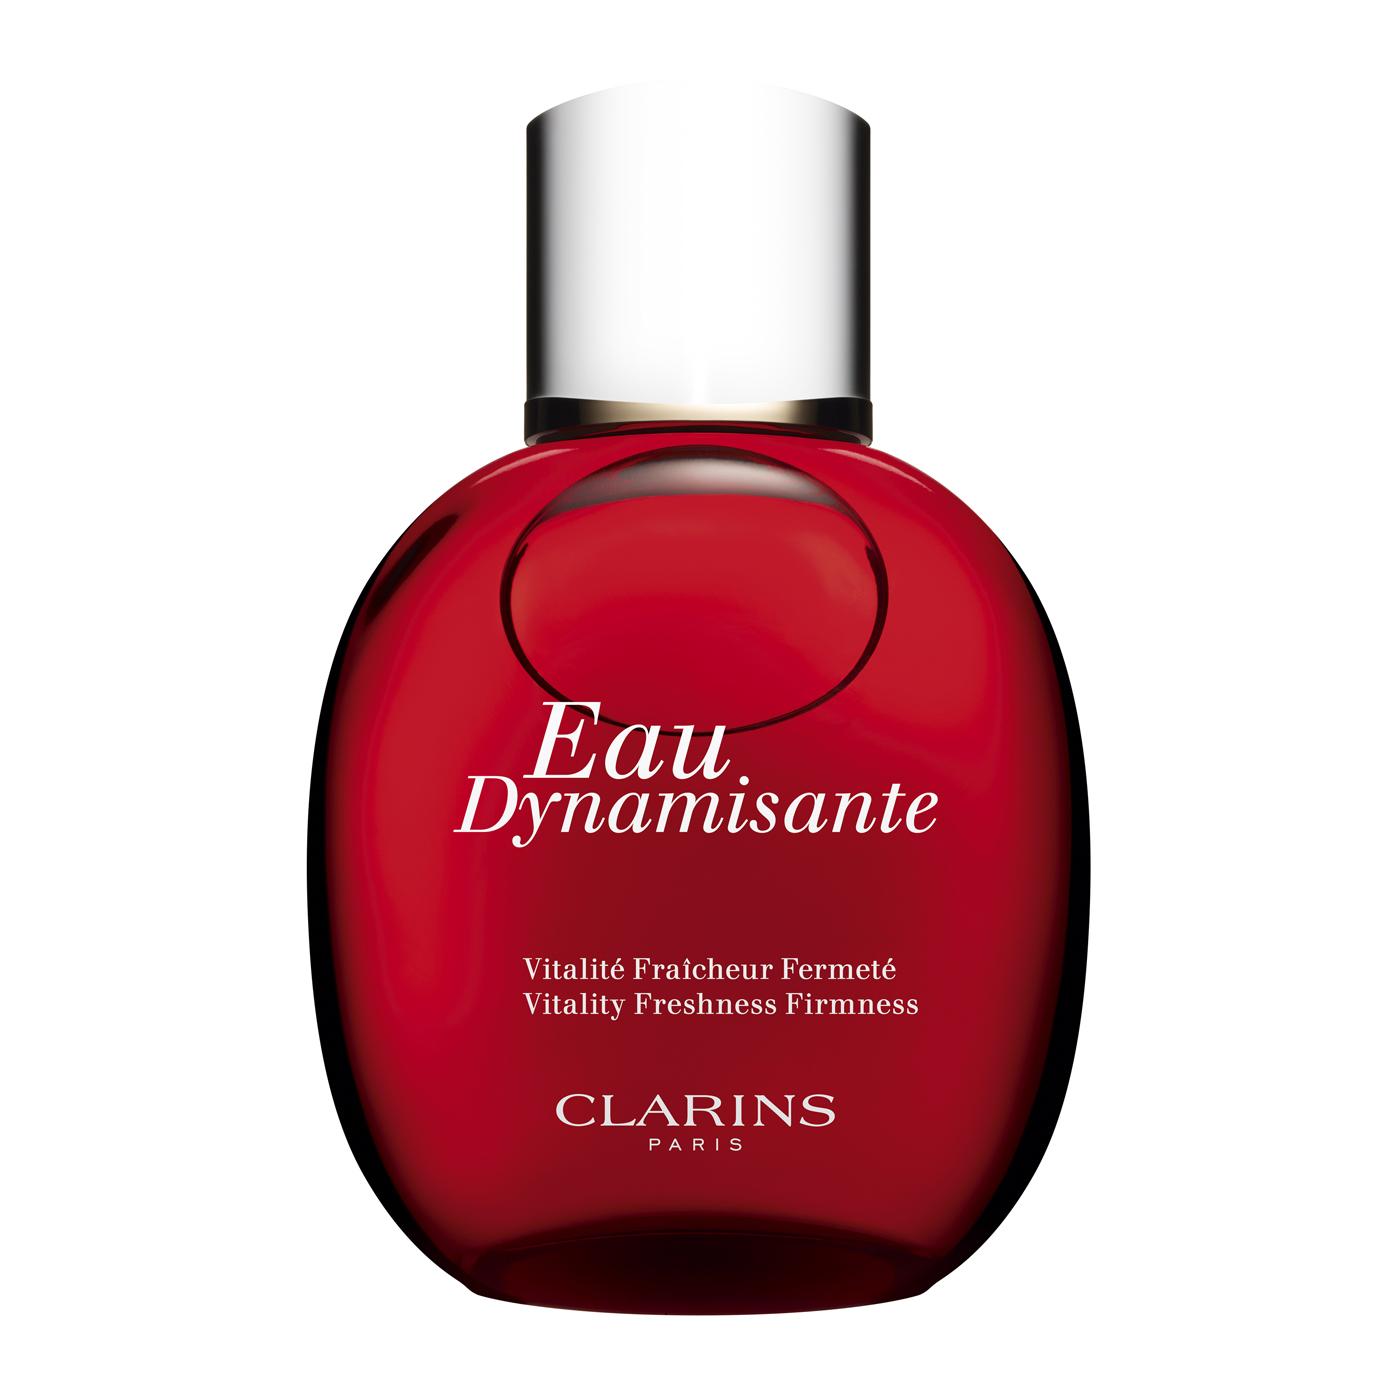 Eau Dynamisante Vitality Freshness And Firmness Clarins Clarins